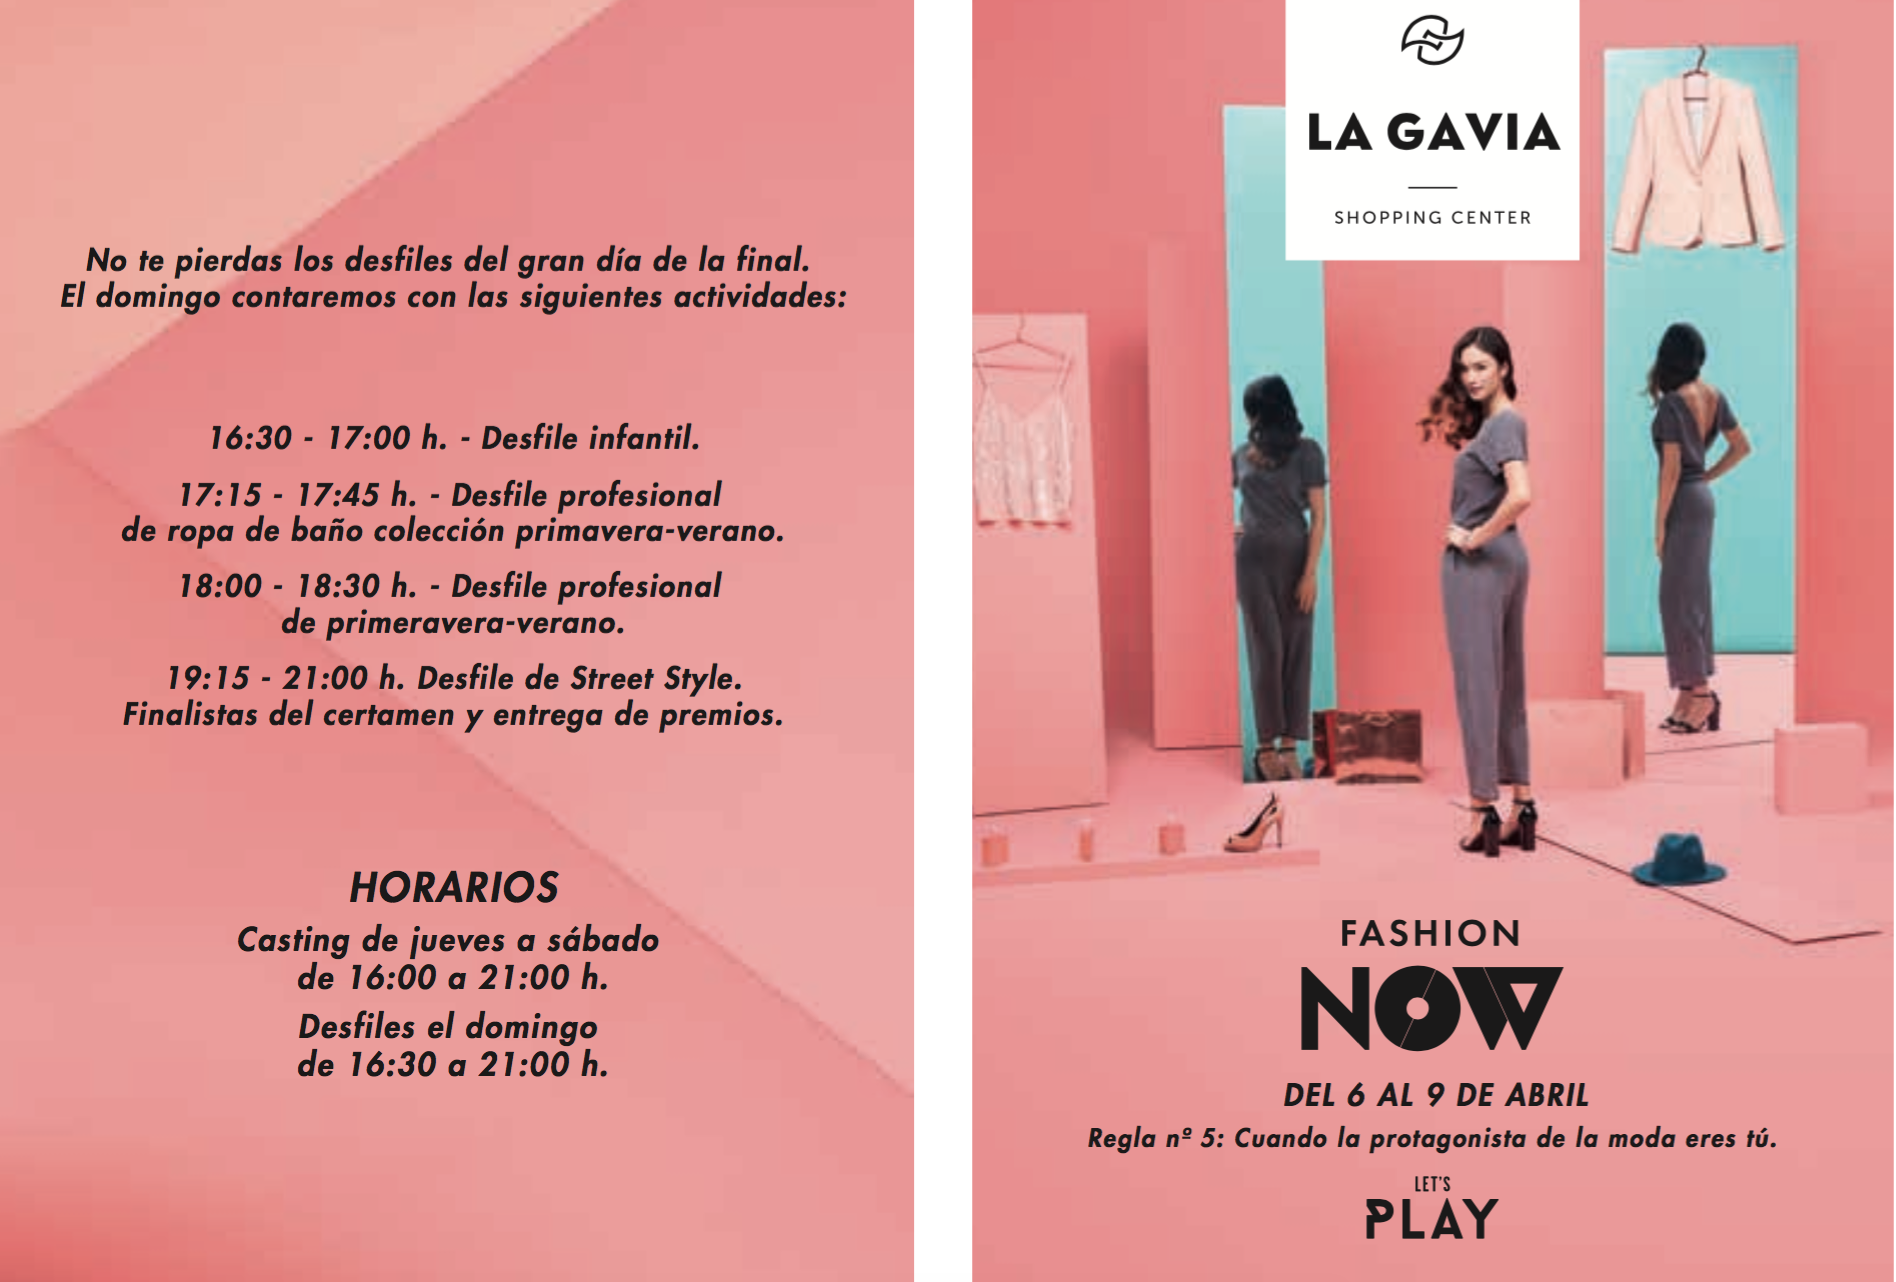 Fashion-Now-La-Gavia-Madrid-blog-de-moda-ChicAdicta-desfile-street-style-Chic-Adicta-PiensaenChic-Piensa-en-Chic